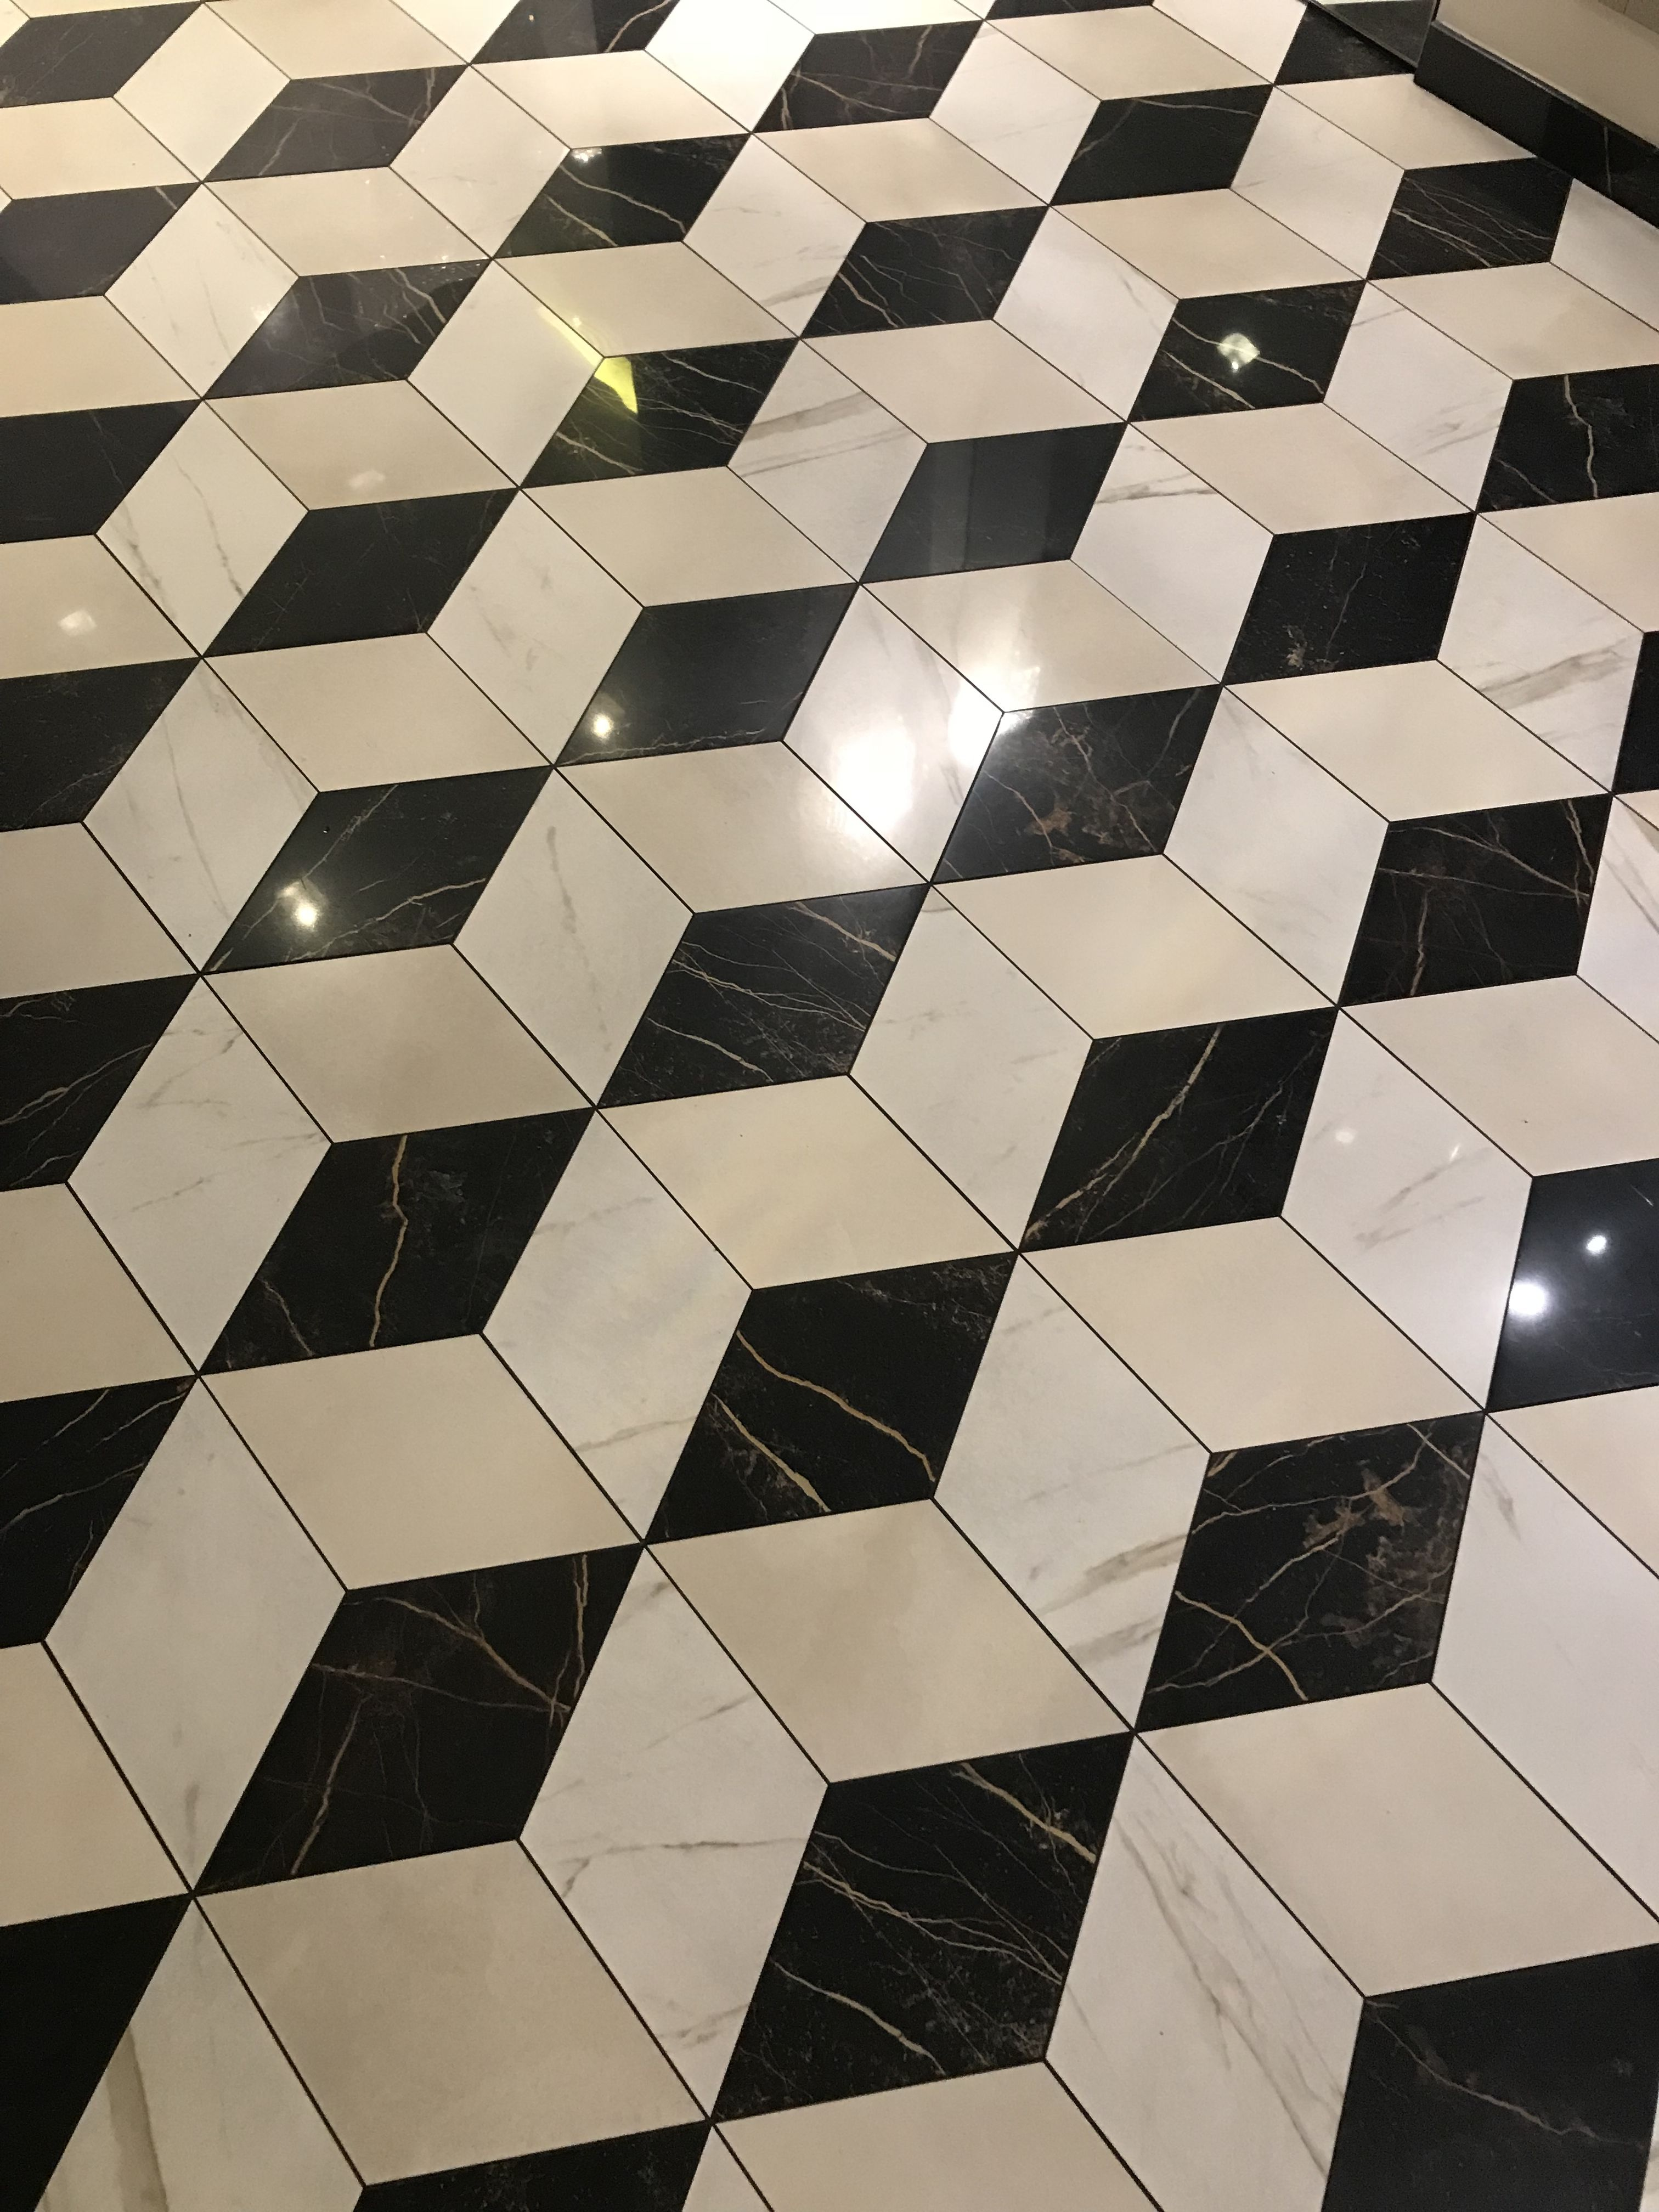 Vloertegels Zwart Wit.Patroon Vloertegels Zwart Wit Beige Vloertegels In 2019